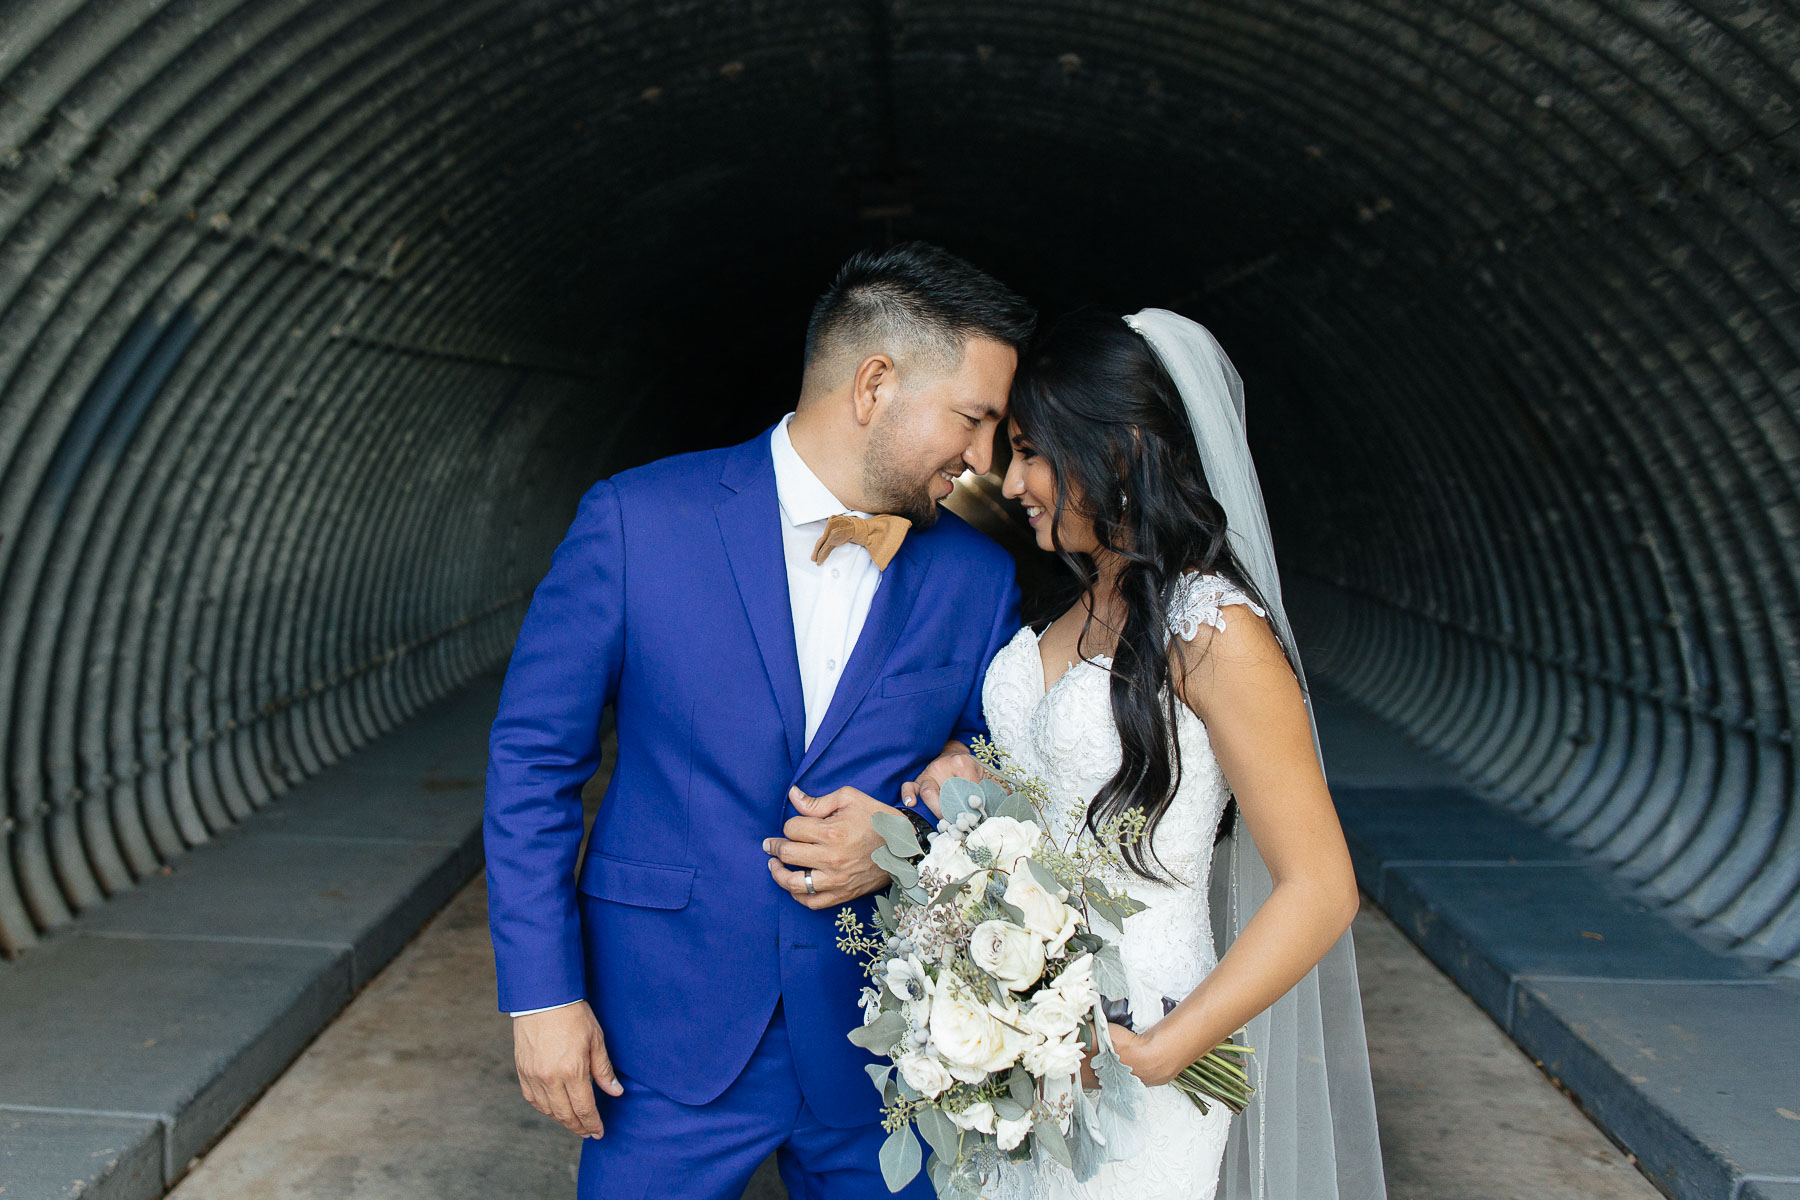 161029-Luxium-Weddings-Arizona-Jeff-Griselda-First-Look-Val-Vista-Lakes-Gilber-061.jpg